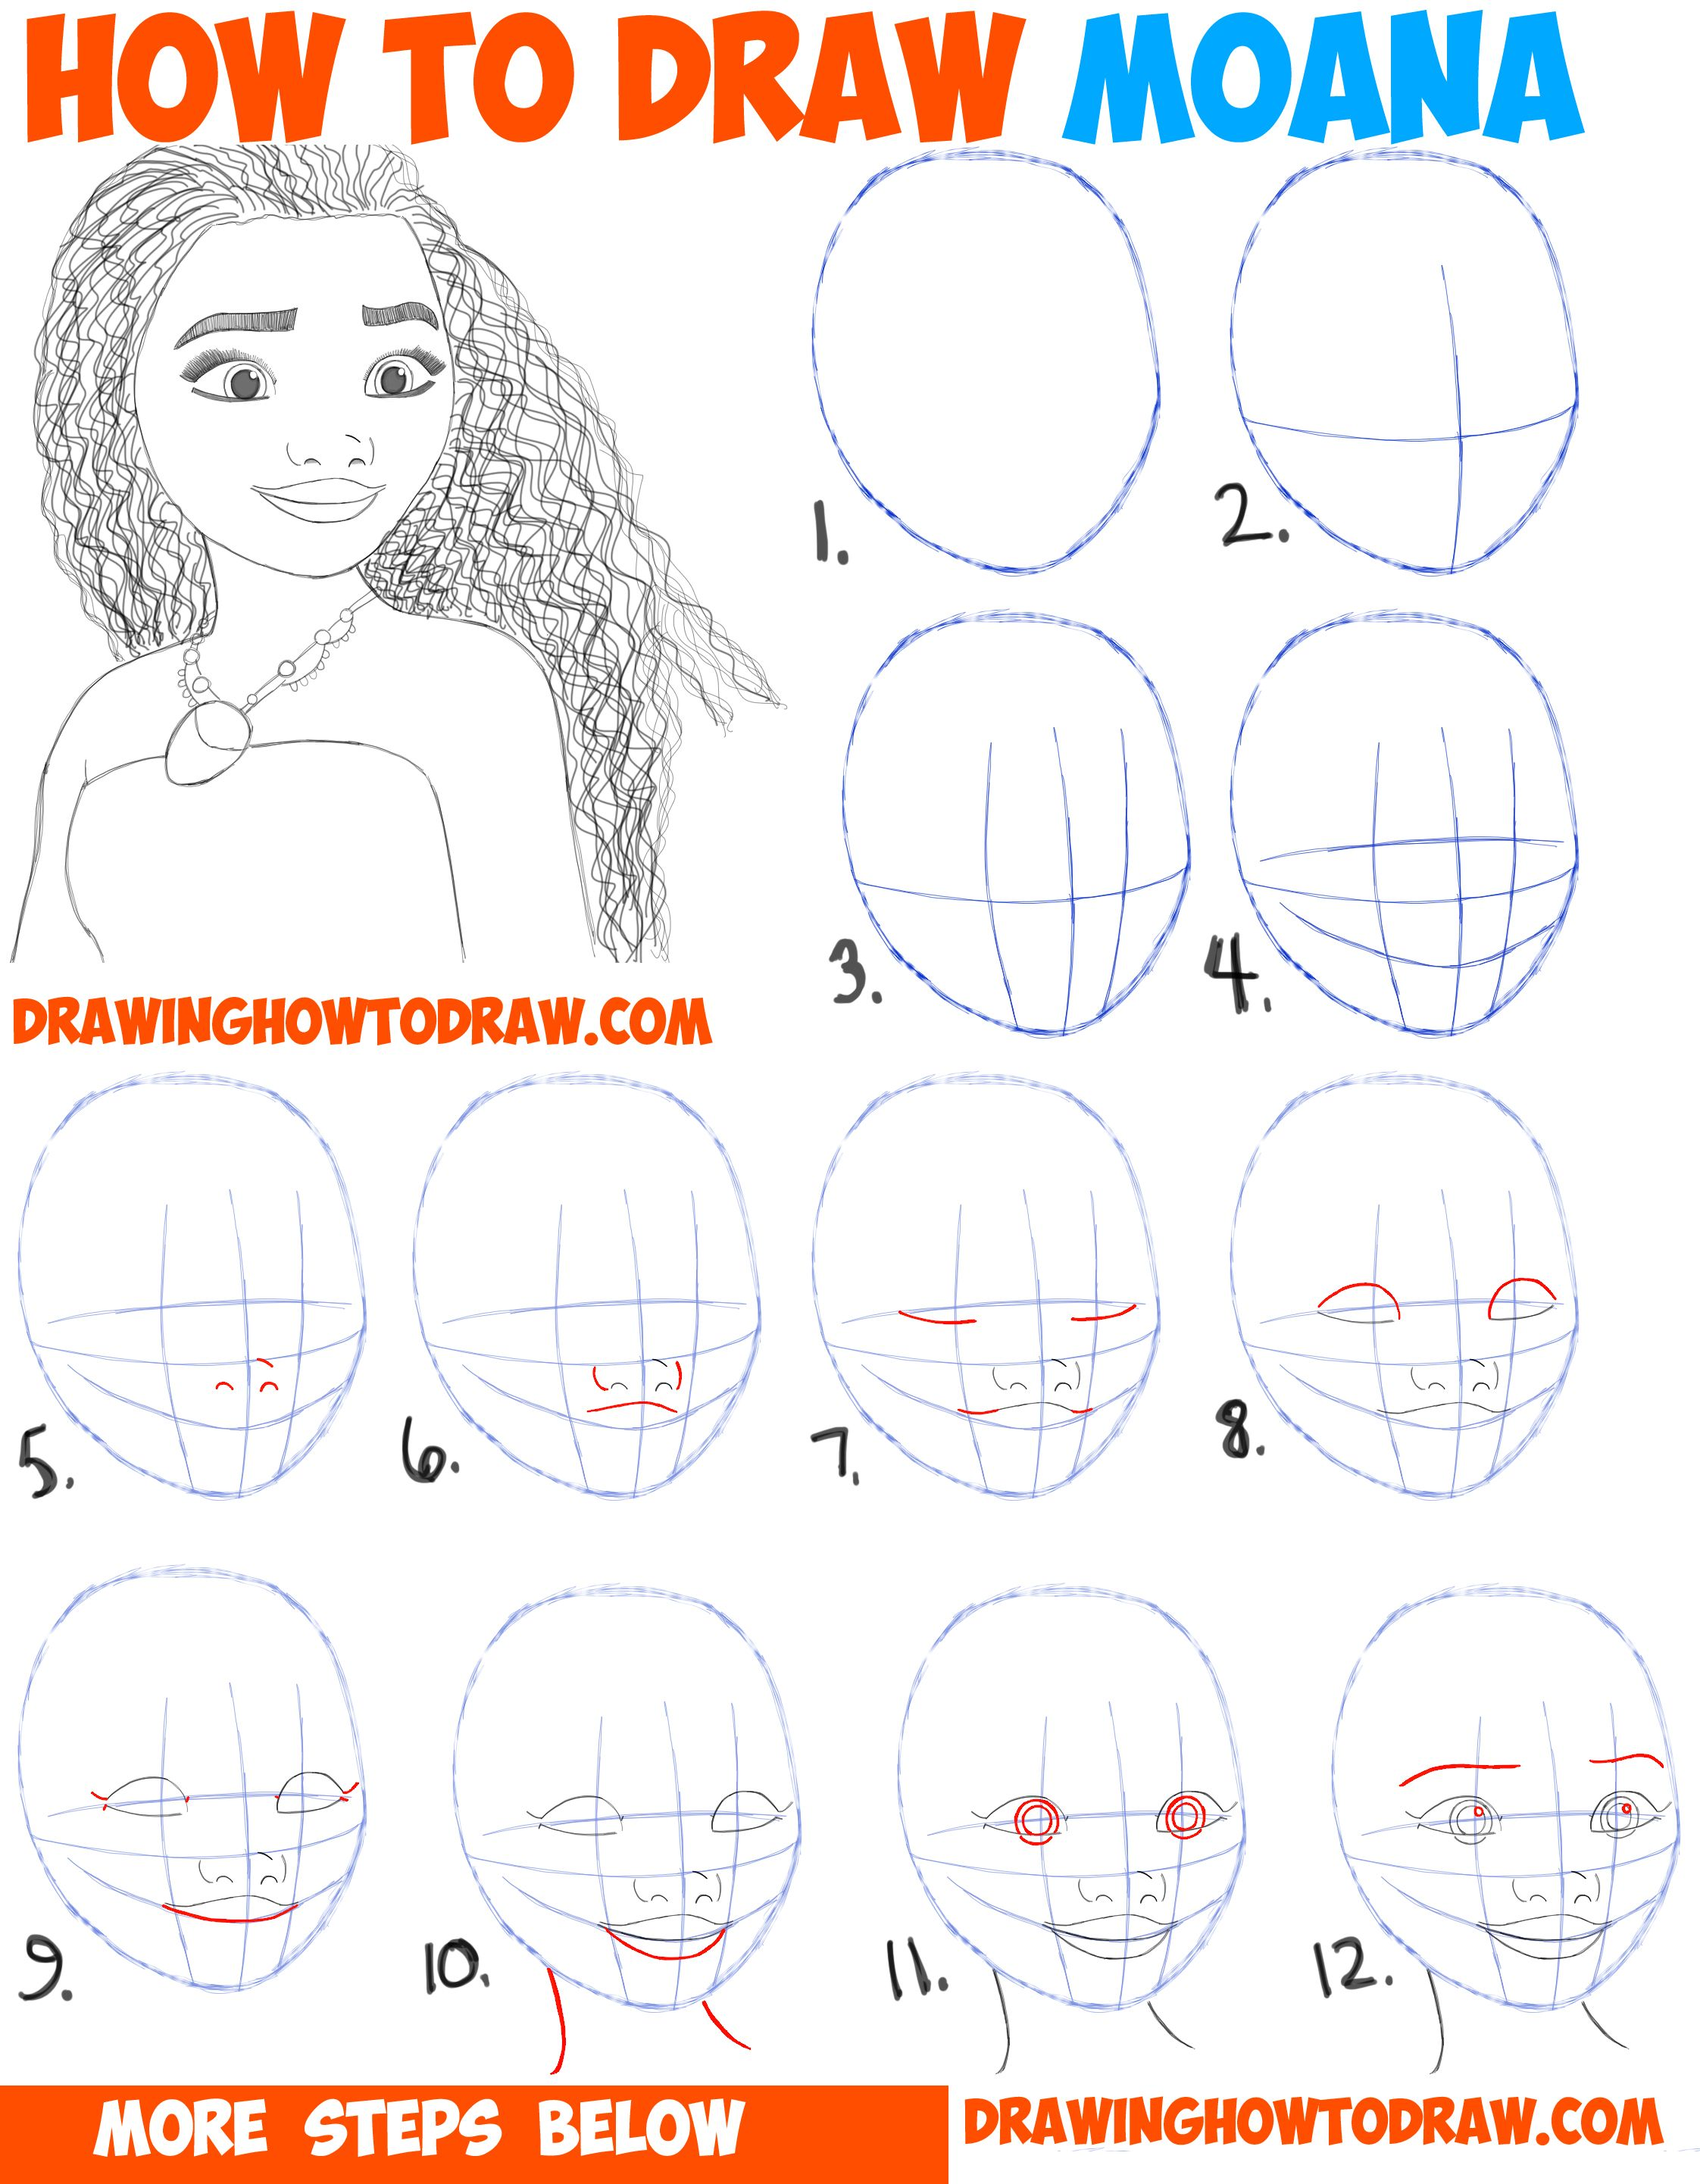 Moana Drawing Easy : moana, drawing, Moana, Drawing, Tutorial, Beginners, Tutorials, Beginners,, Kids,